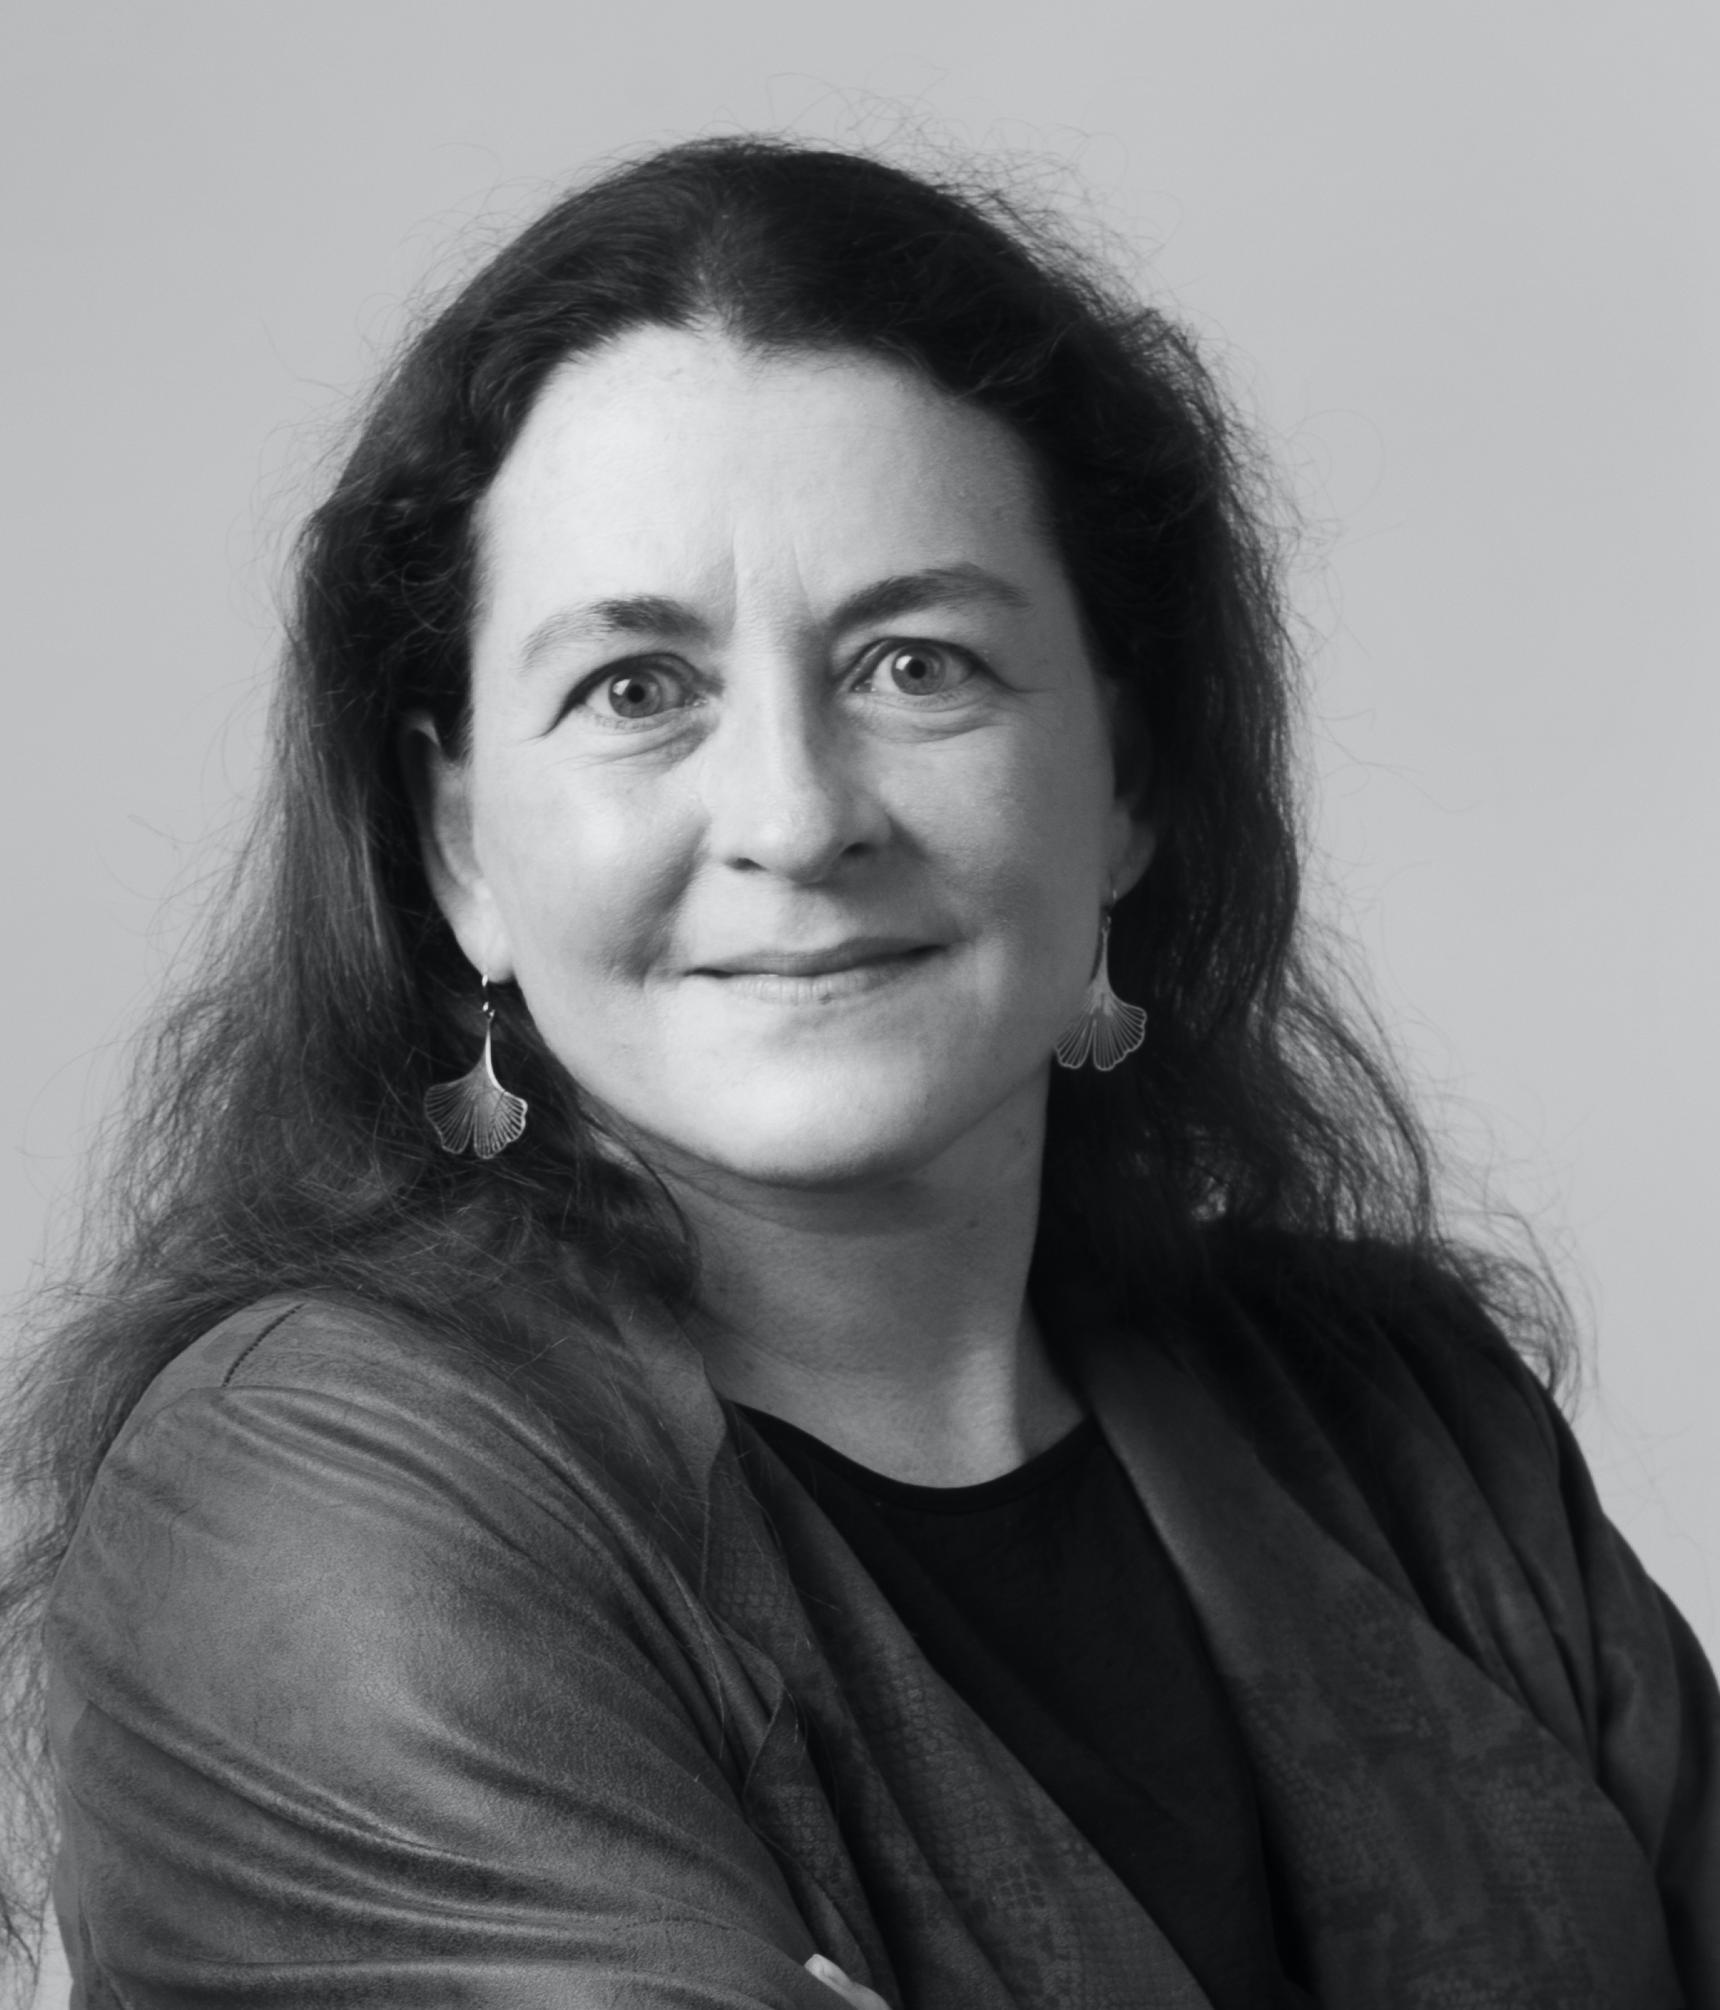 Michele Caroff